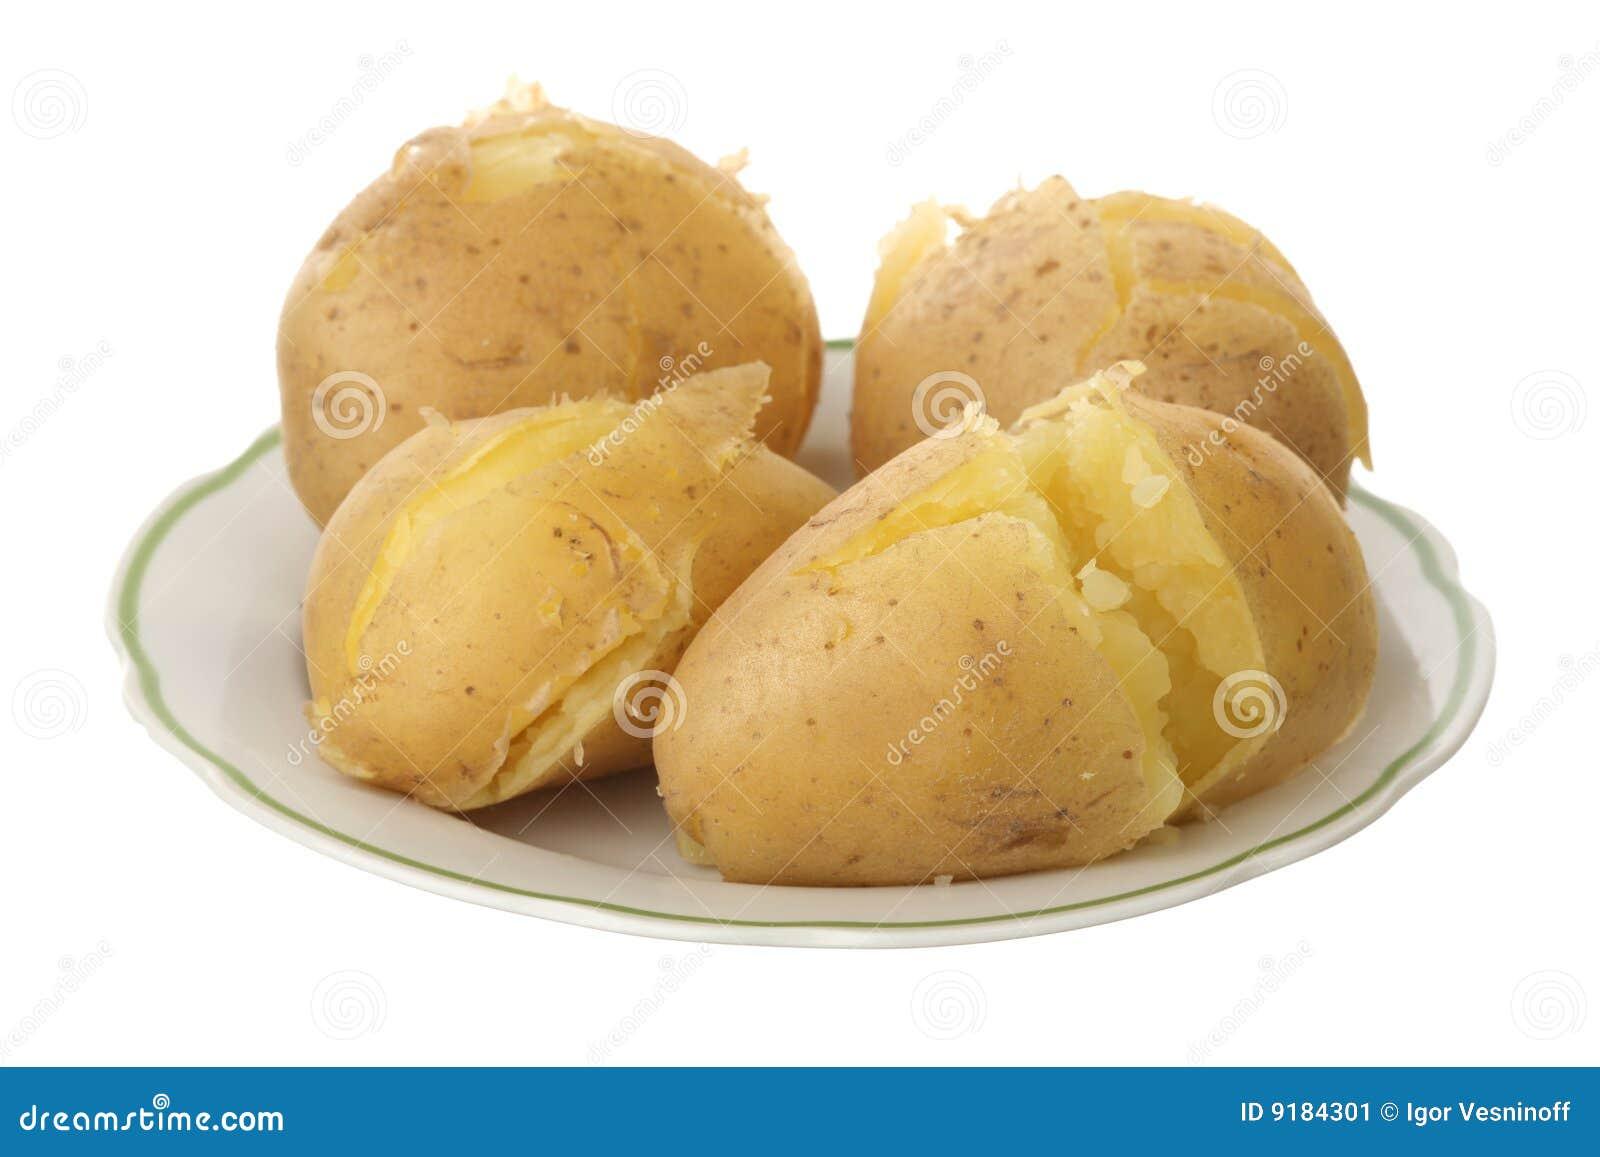 RPH Catering (Jacket Potato Trailer)